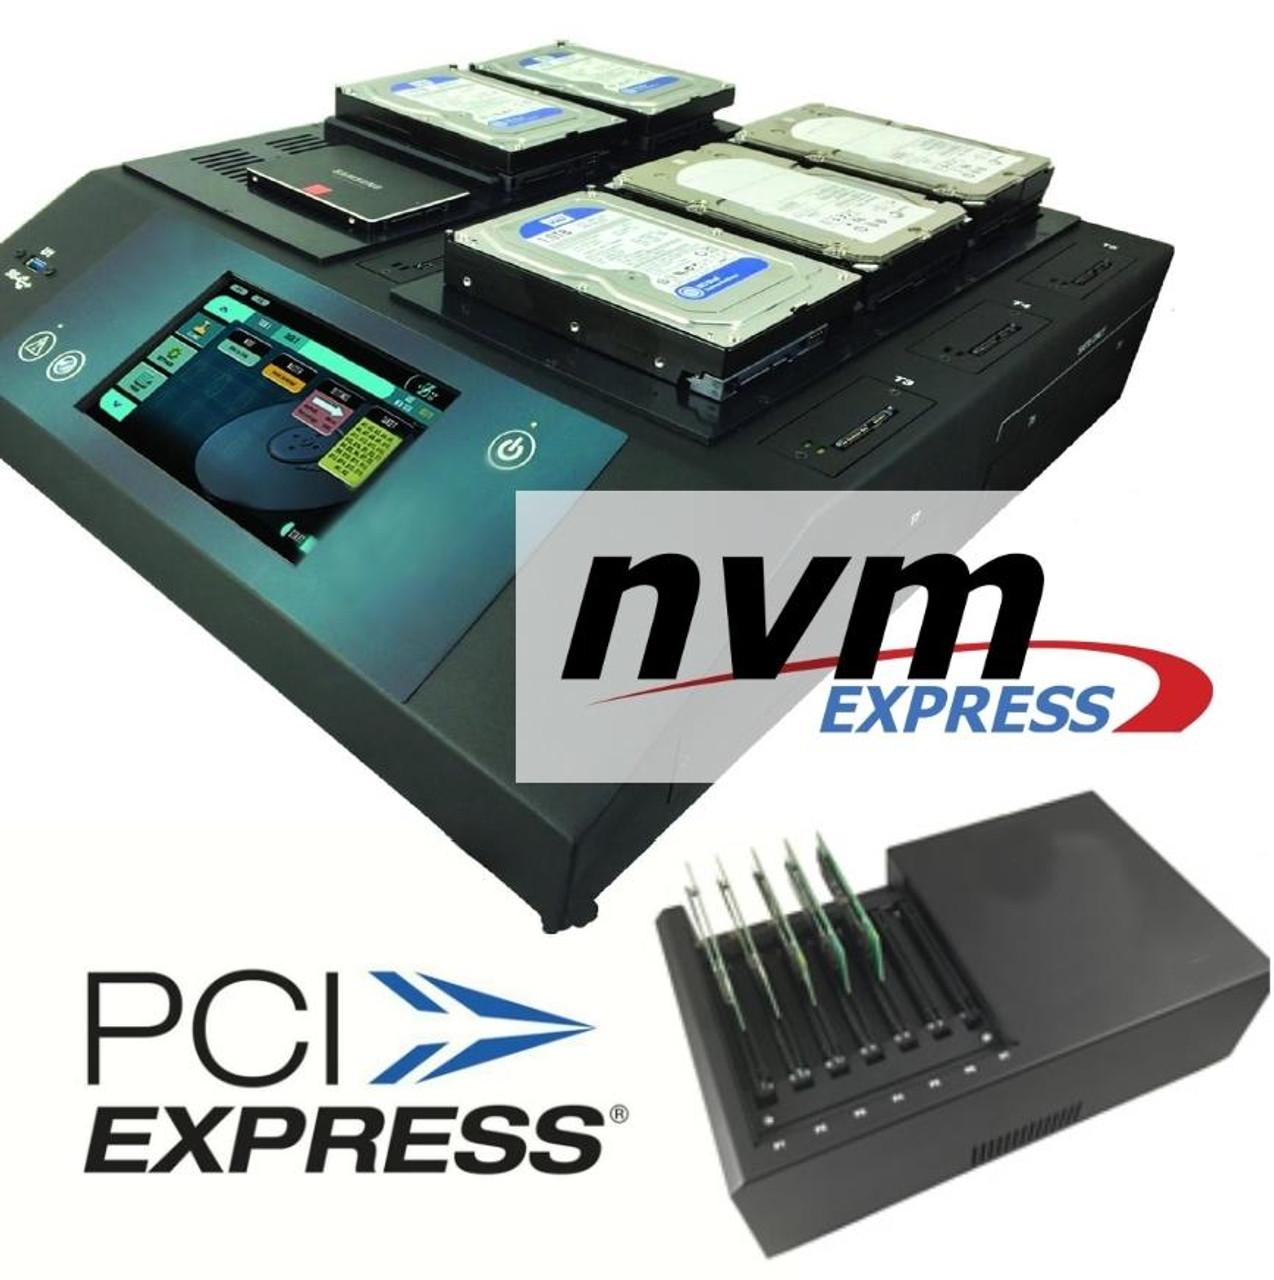 ZCXIPCIE, SAS, SATA Drive Duplicator - Multi-Target Multi-Session, Multi-Protocol